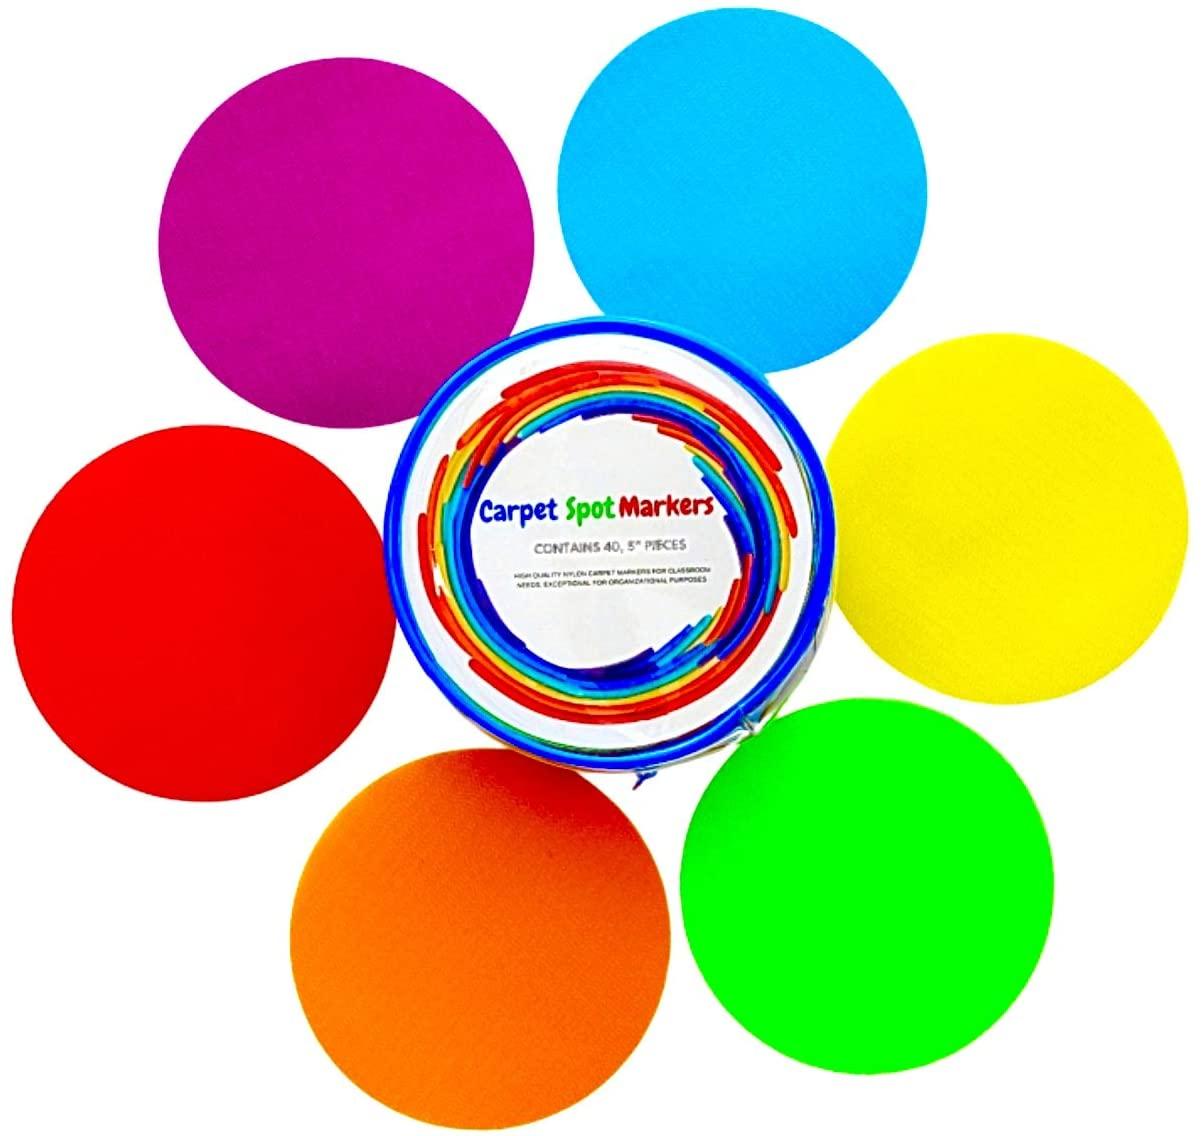 40 Pcs Carpet Spot Markers for Classroom - Classroom Supplies for Teachers Elementary Kids Dots Sit Spots Carpet Dots Kids Carpet Dots